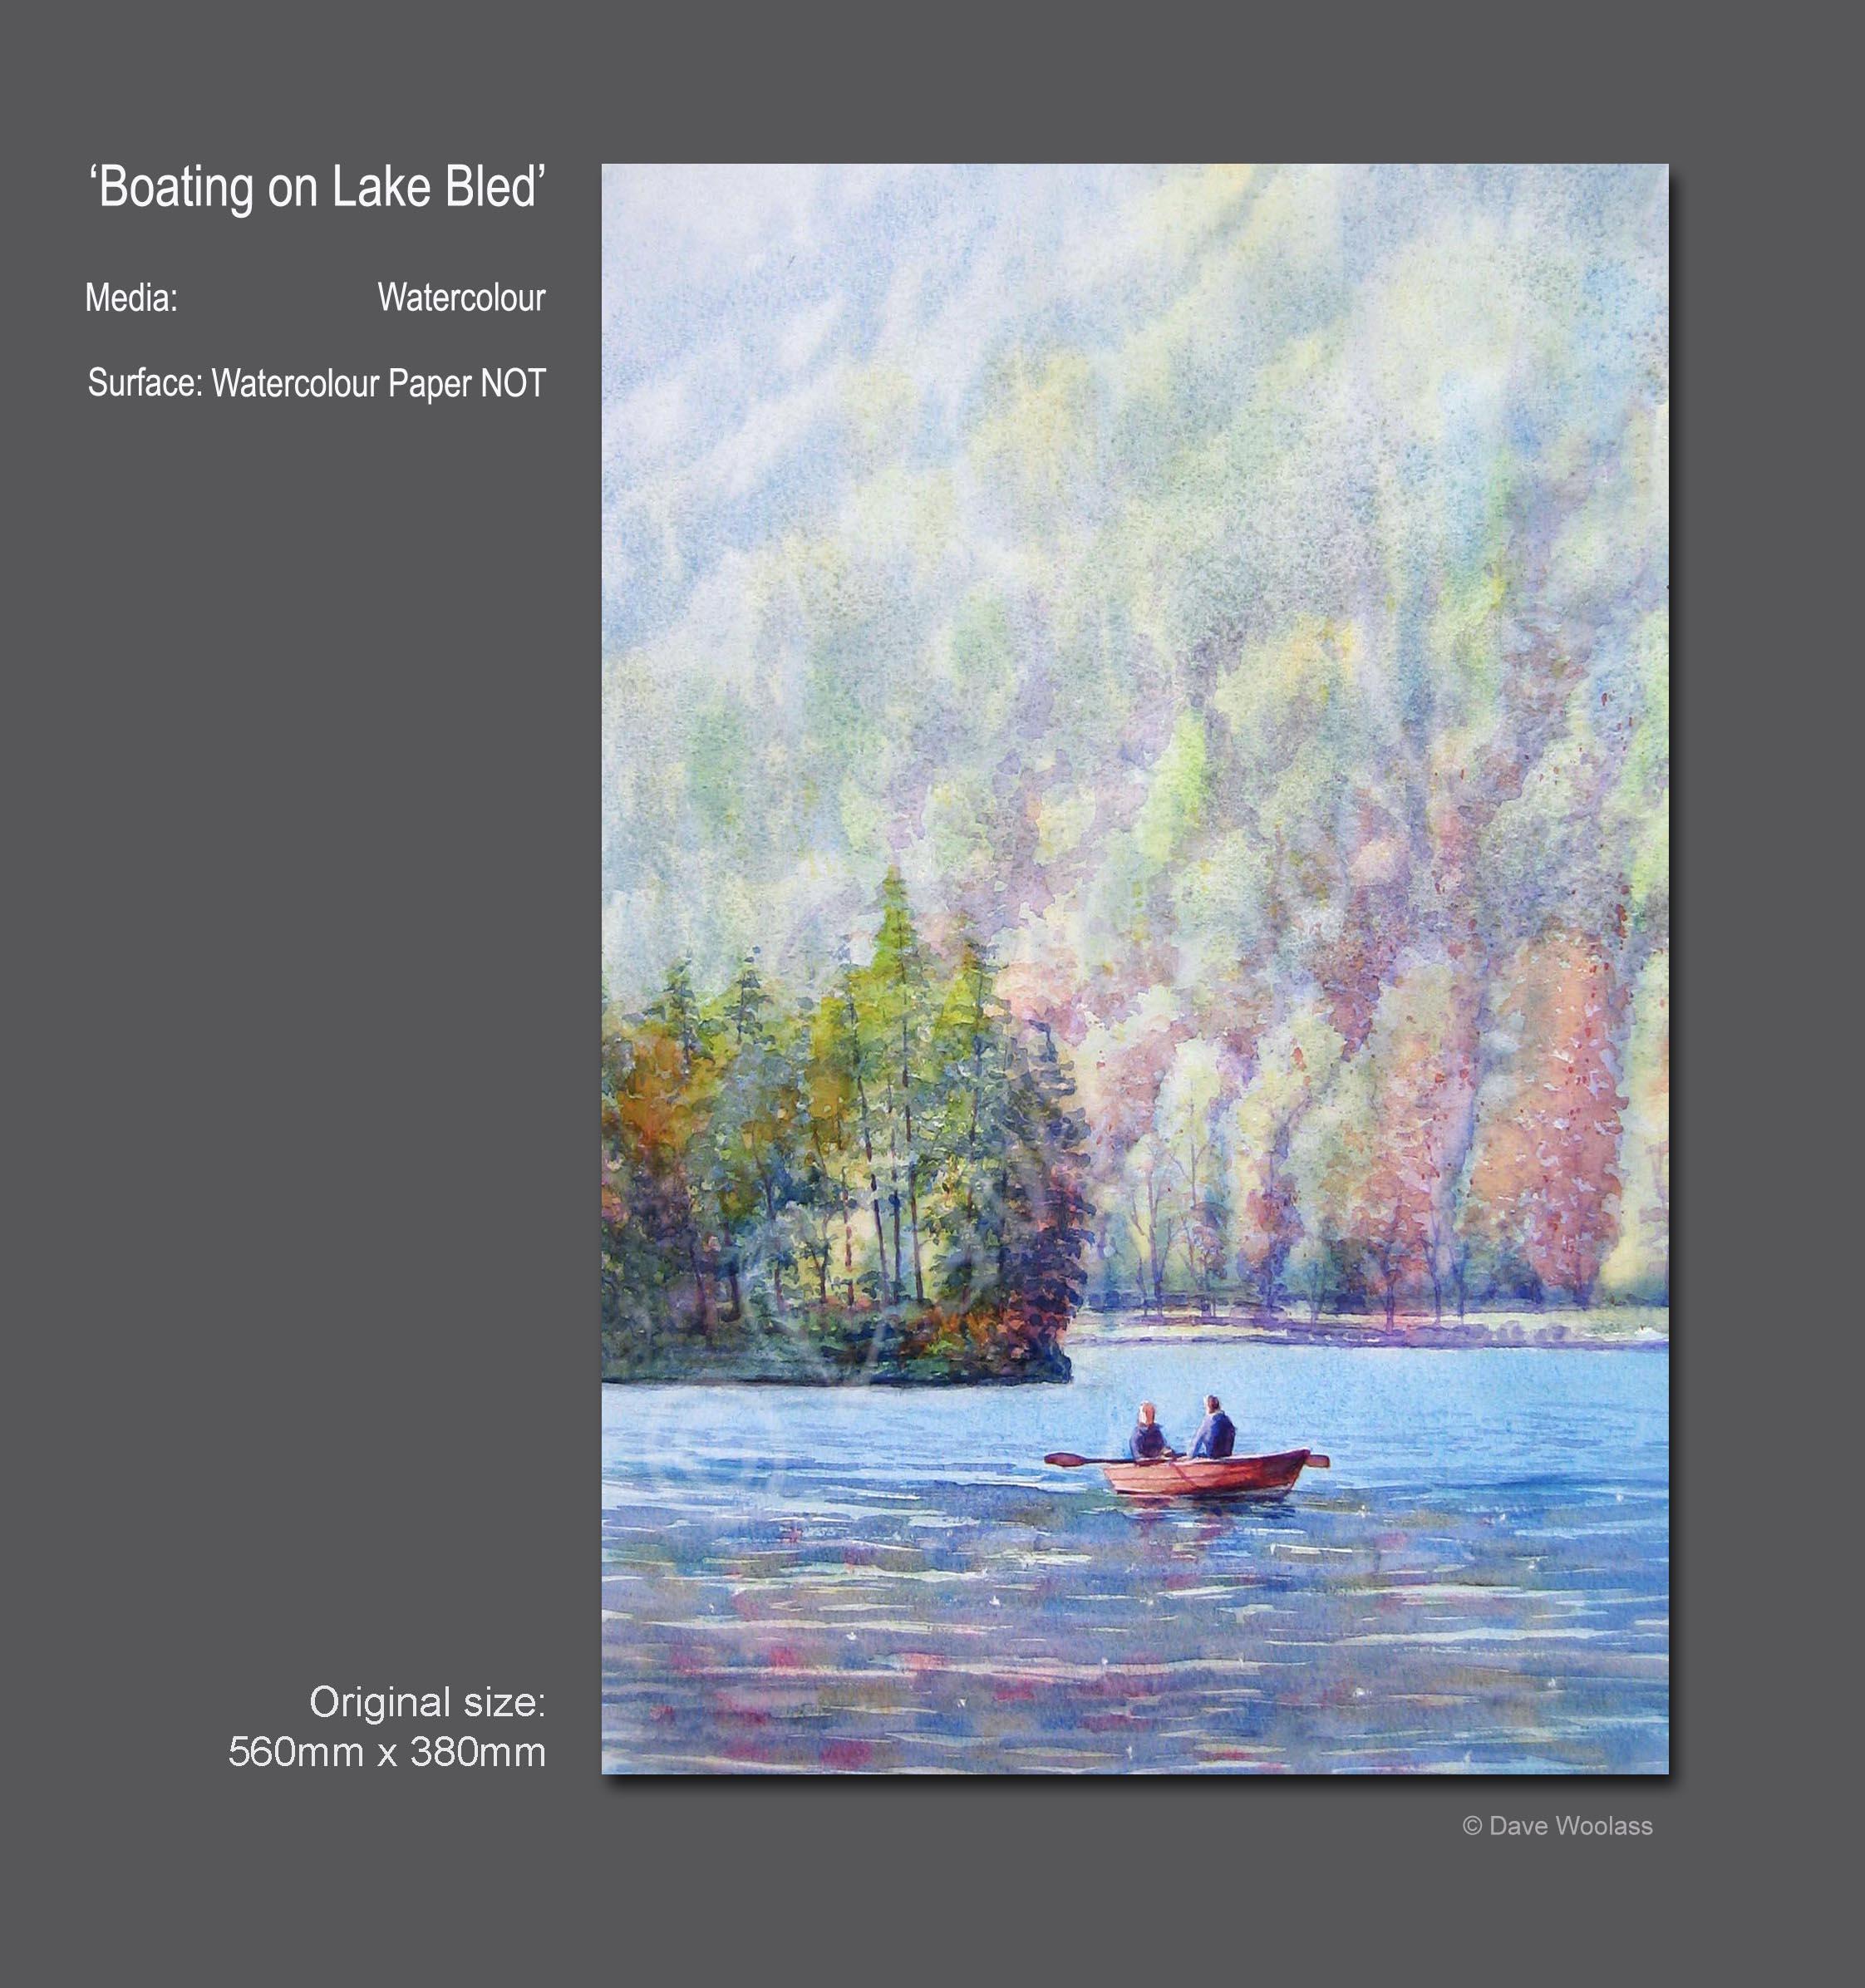 Boating on Lake Bled